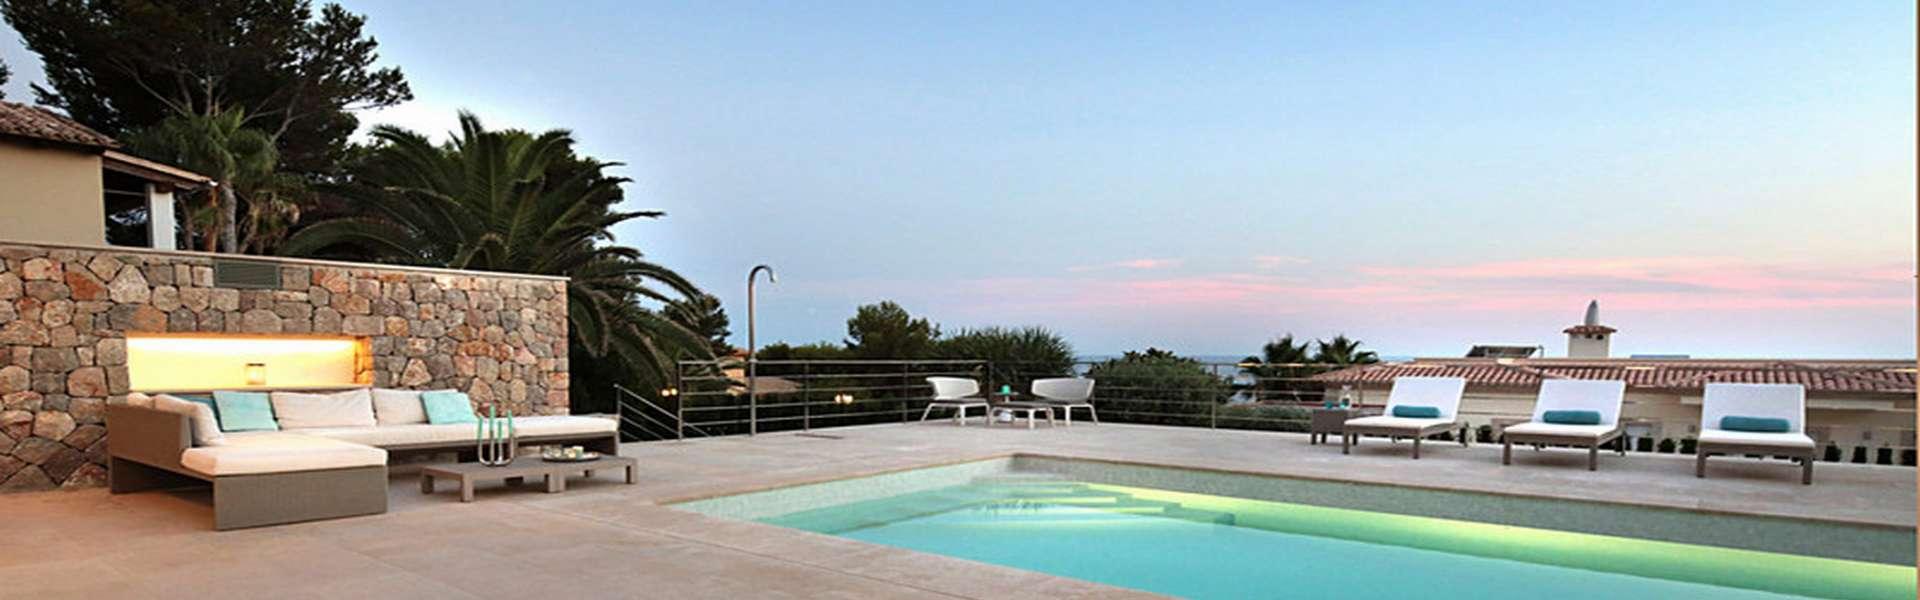 Santa Ponsa/Nova Santa Ponsa - Elegante Villa mit Meerblick in Top-Lage